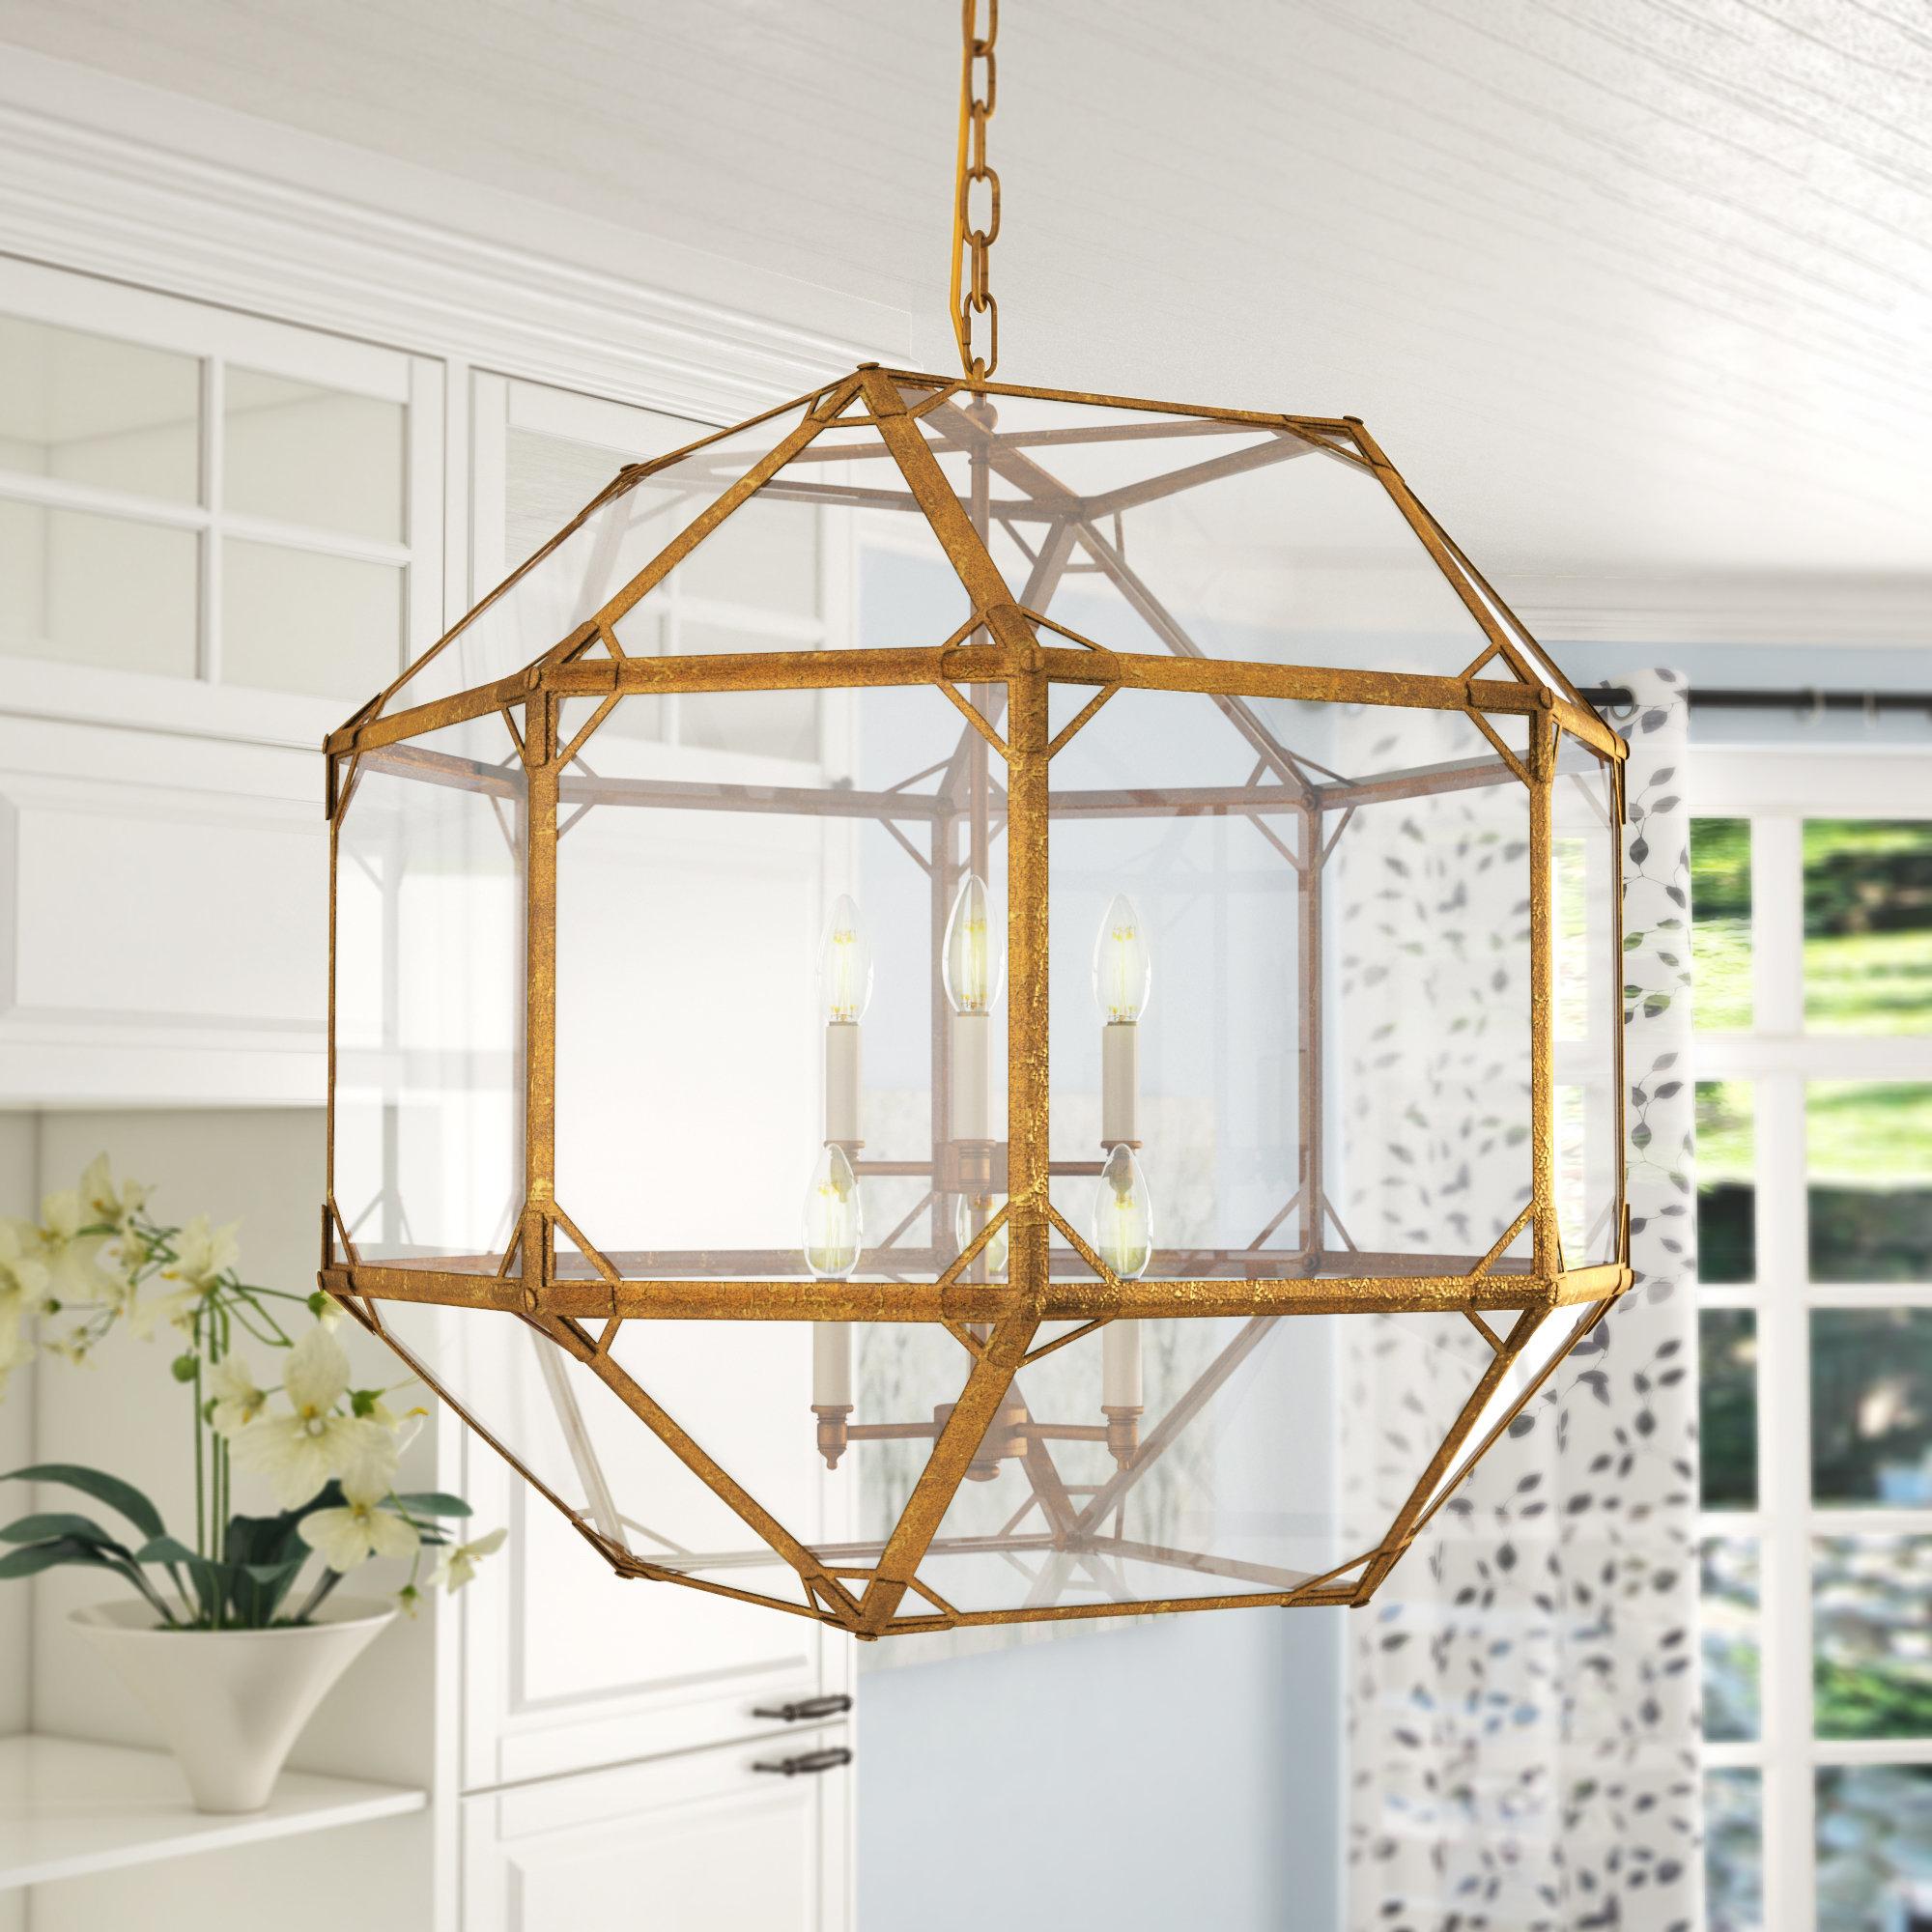 Gold Geometric Light Fixture | Wayfair With Nisbet 4 Light Lantern Geometric Pendants (View 20 of 30)